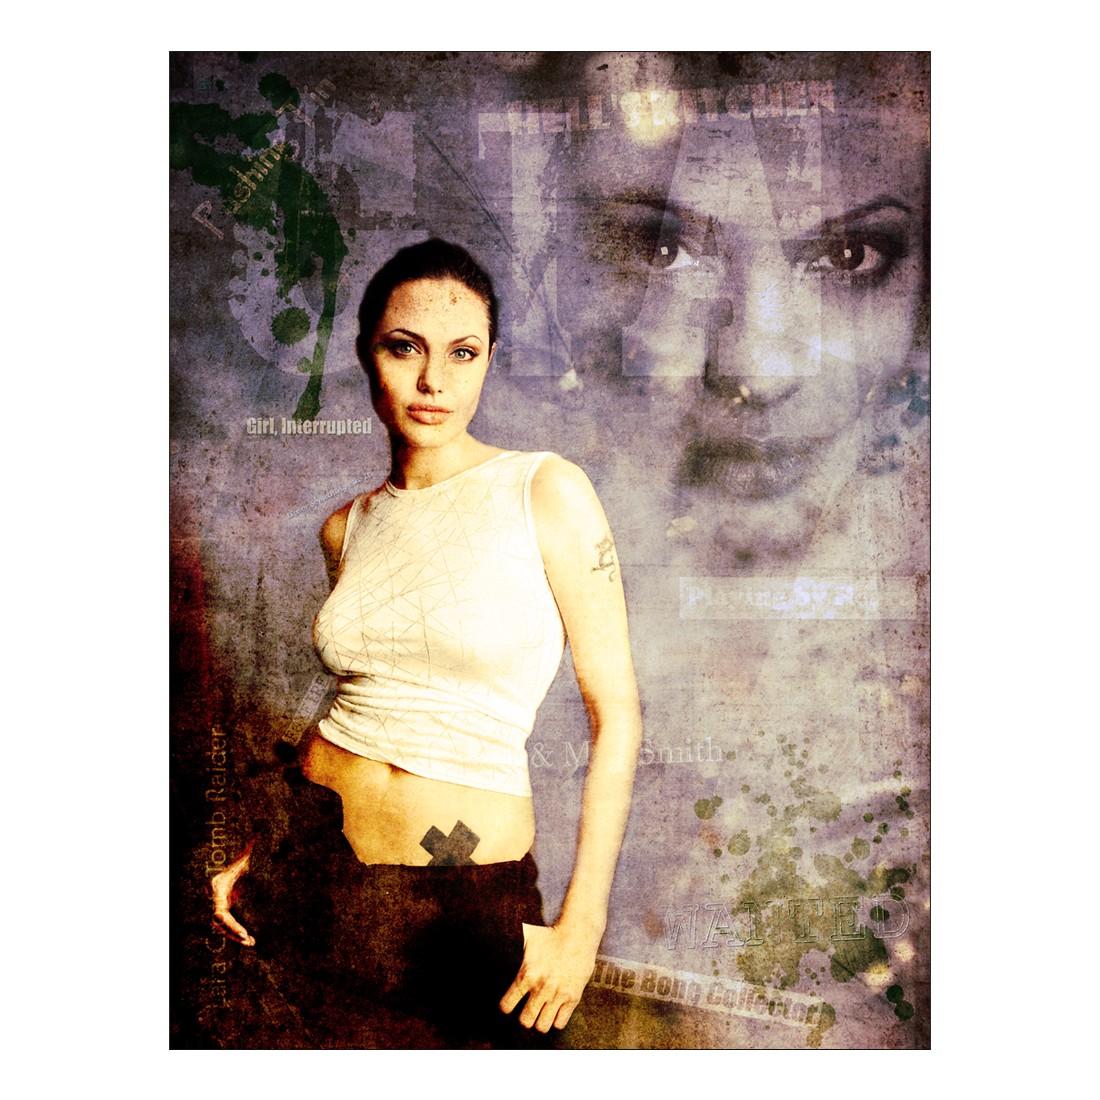 Leinwandbild Angelina Jolie I – 100 x 75cm, Gallery of Innovative Art günstig bestellen